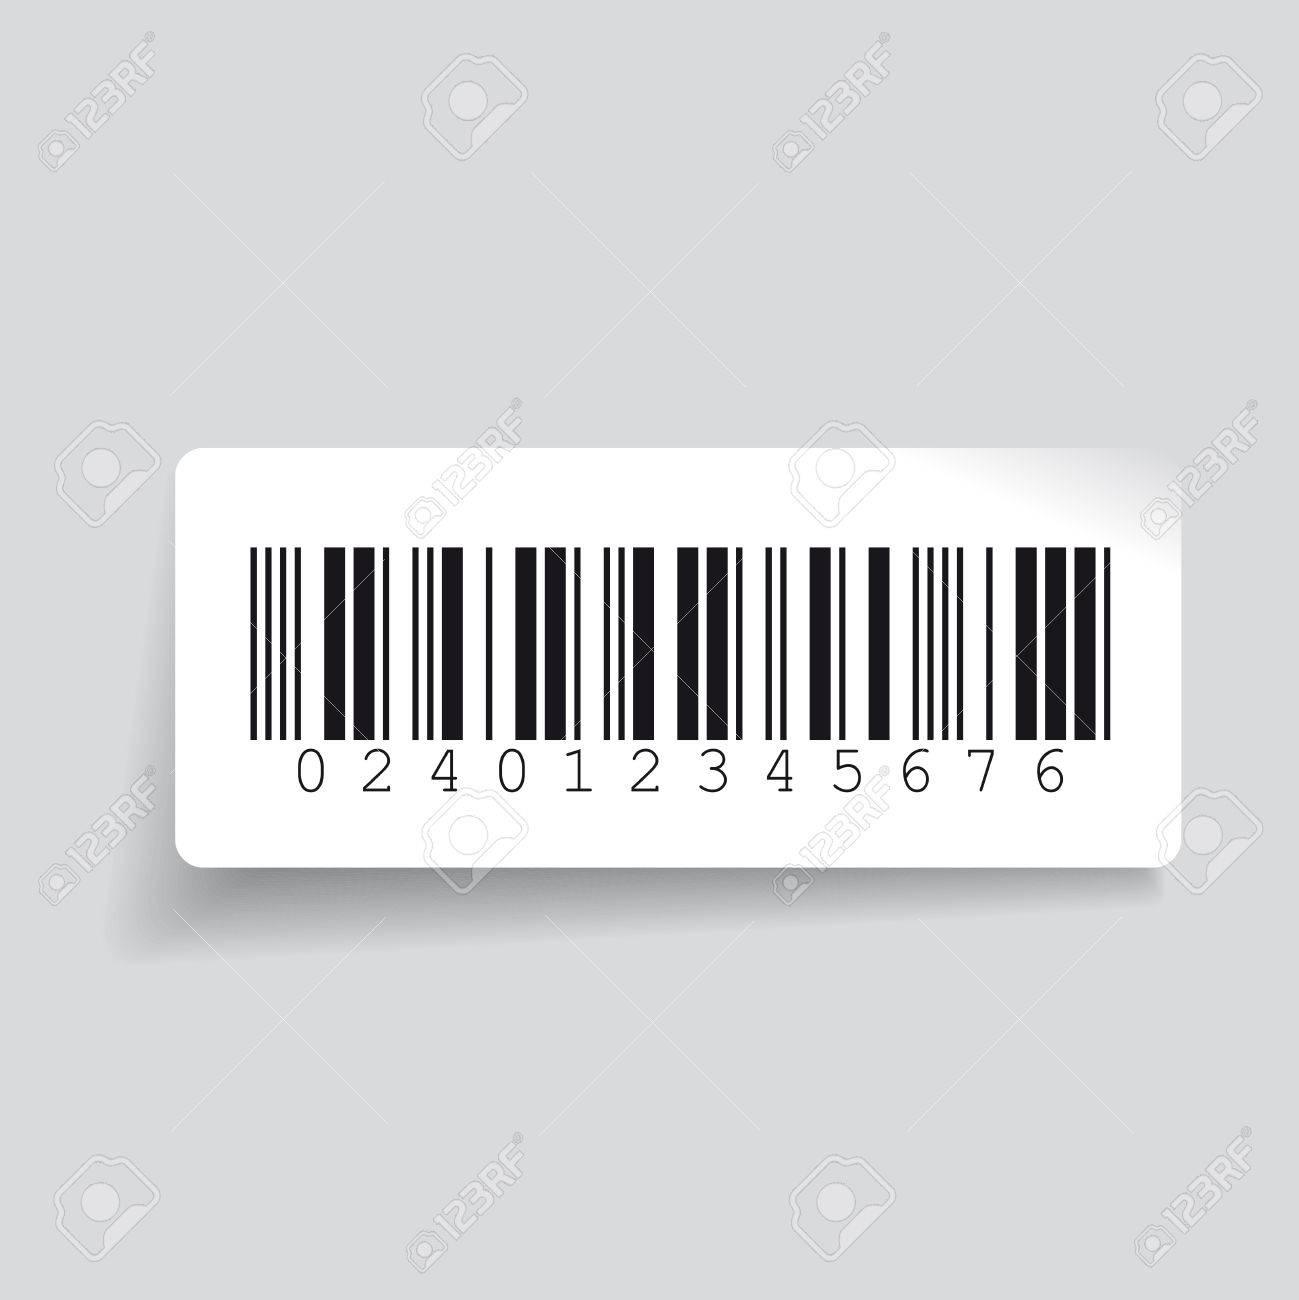 Barcode label vector - 46535760